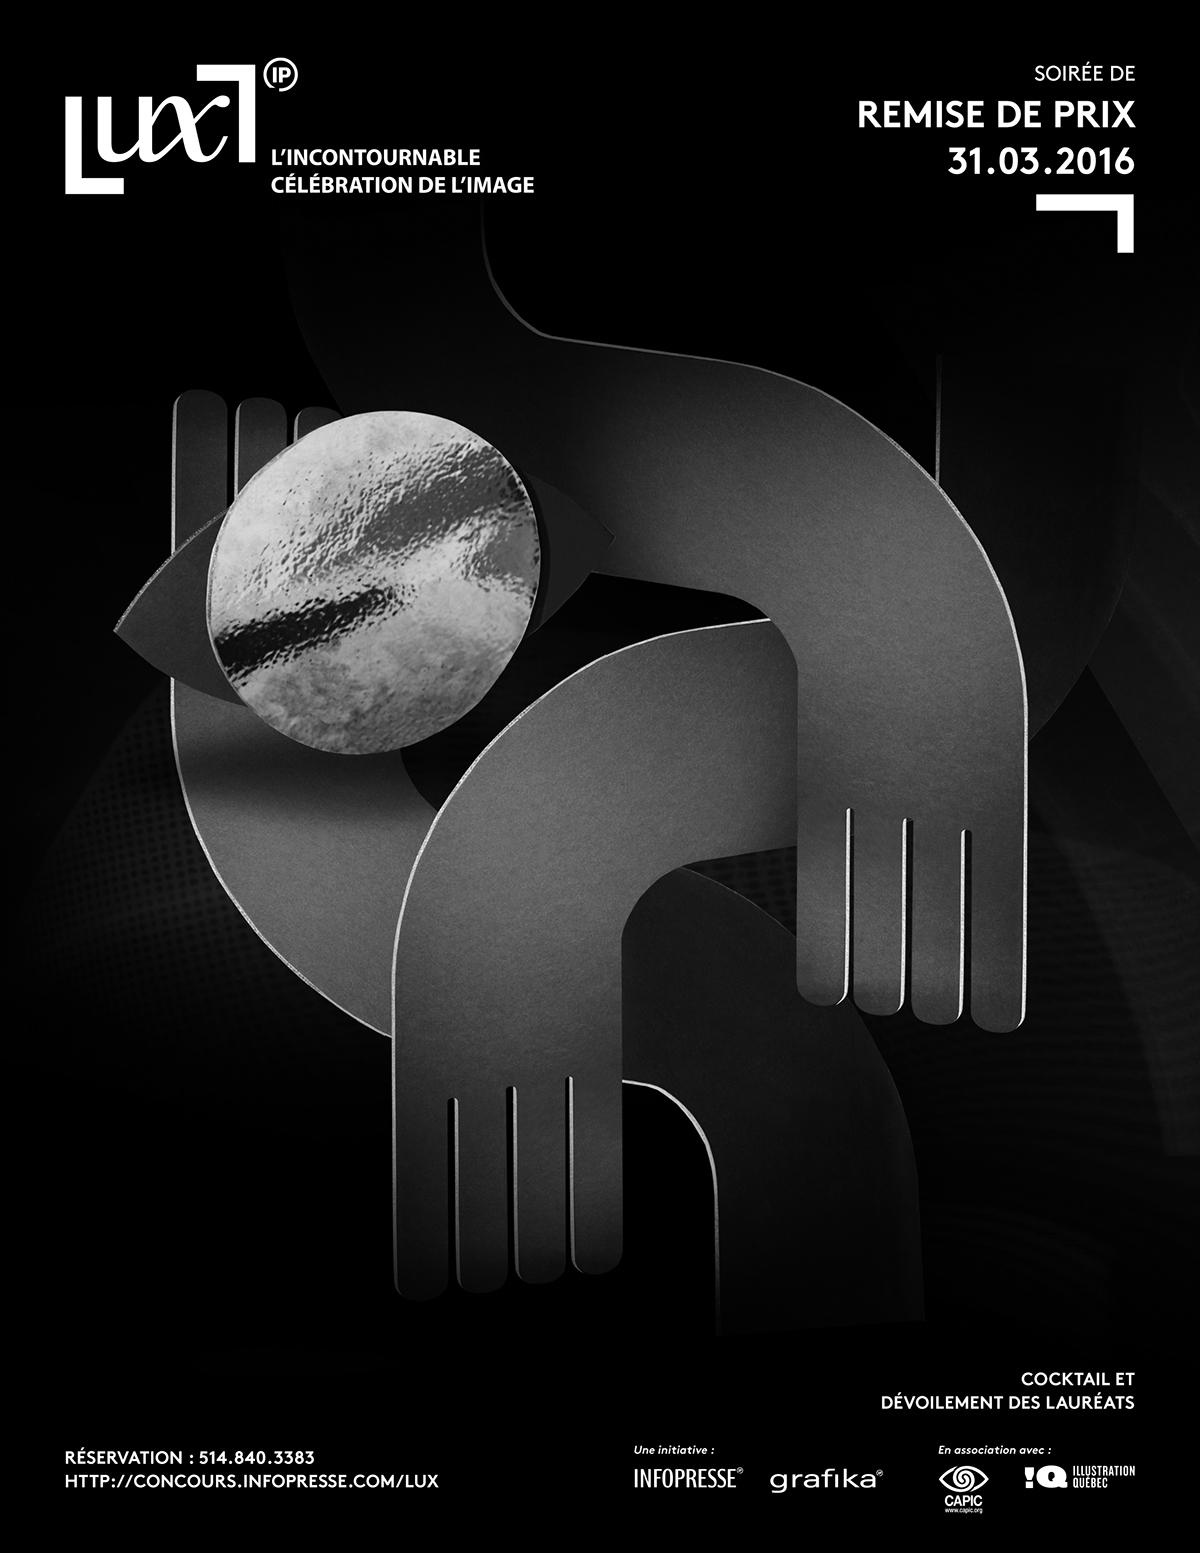 concours-lux-2016-infopresse-grafika-jll-photogrpahies-bye-bye-bambi-montreal-quebec-3.jpg